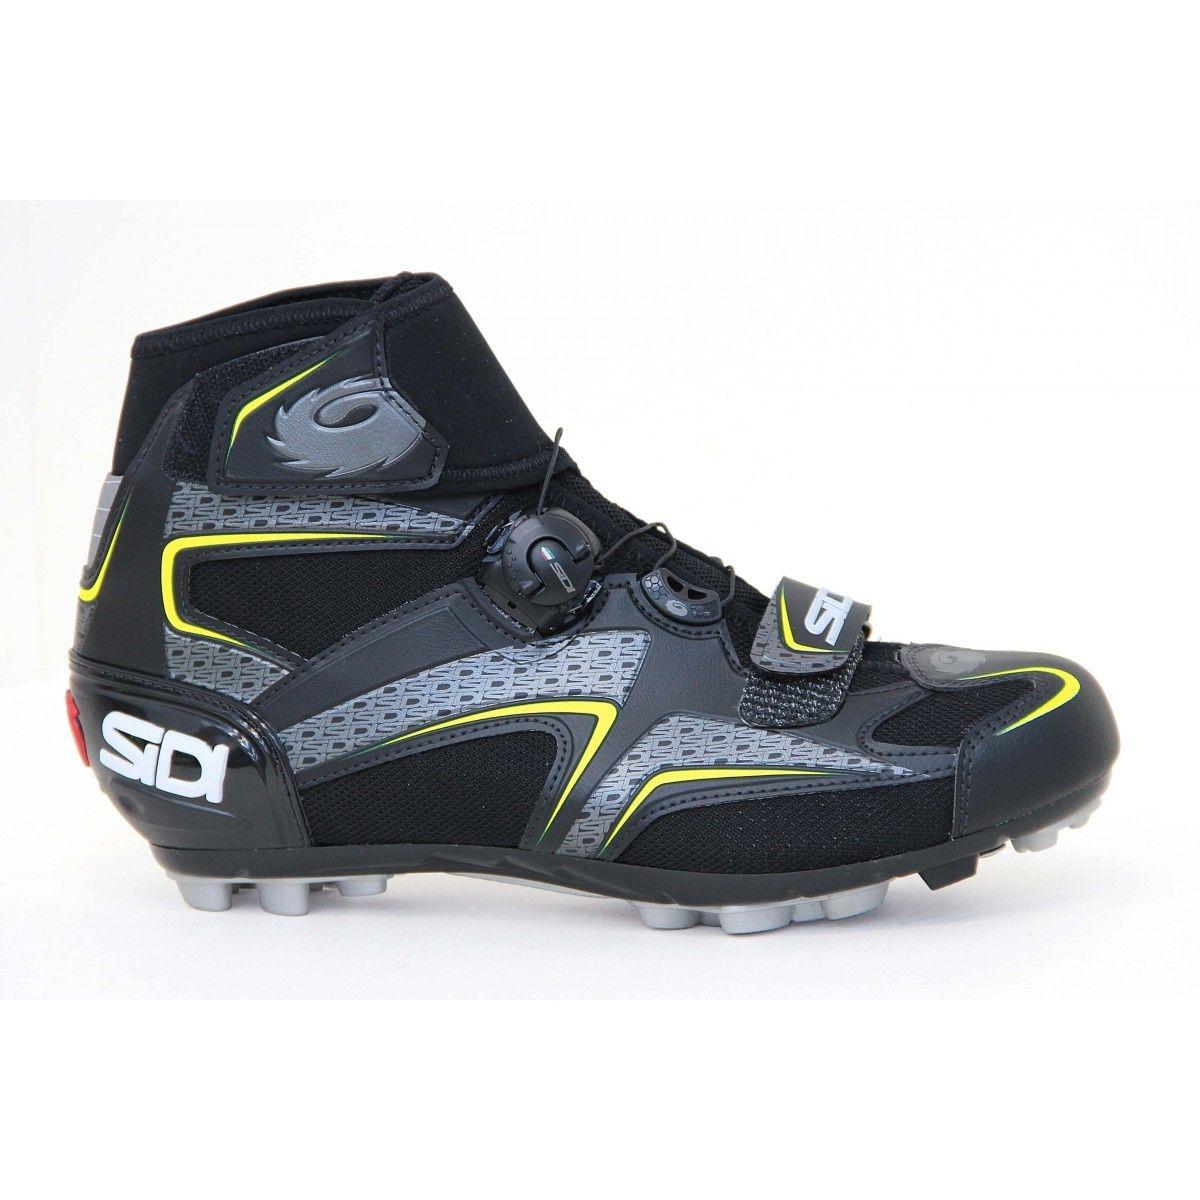 Chaussures VTT FROST GORE MTB Running Trail Sidi